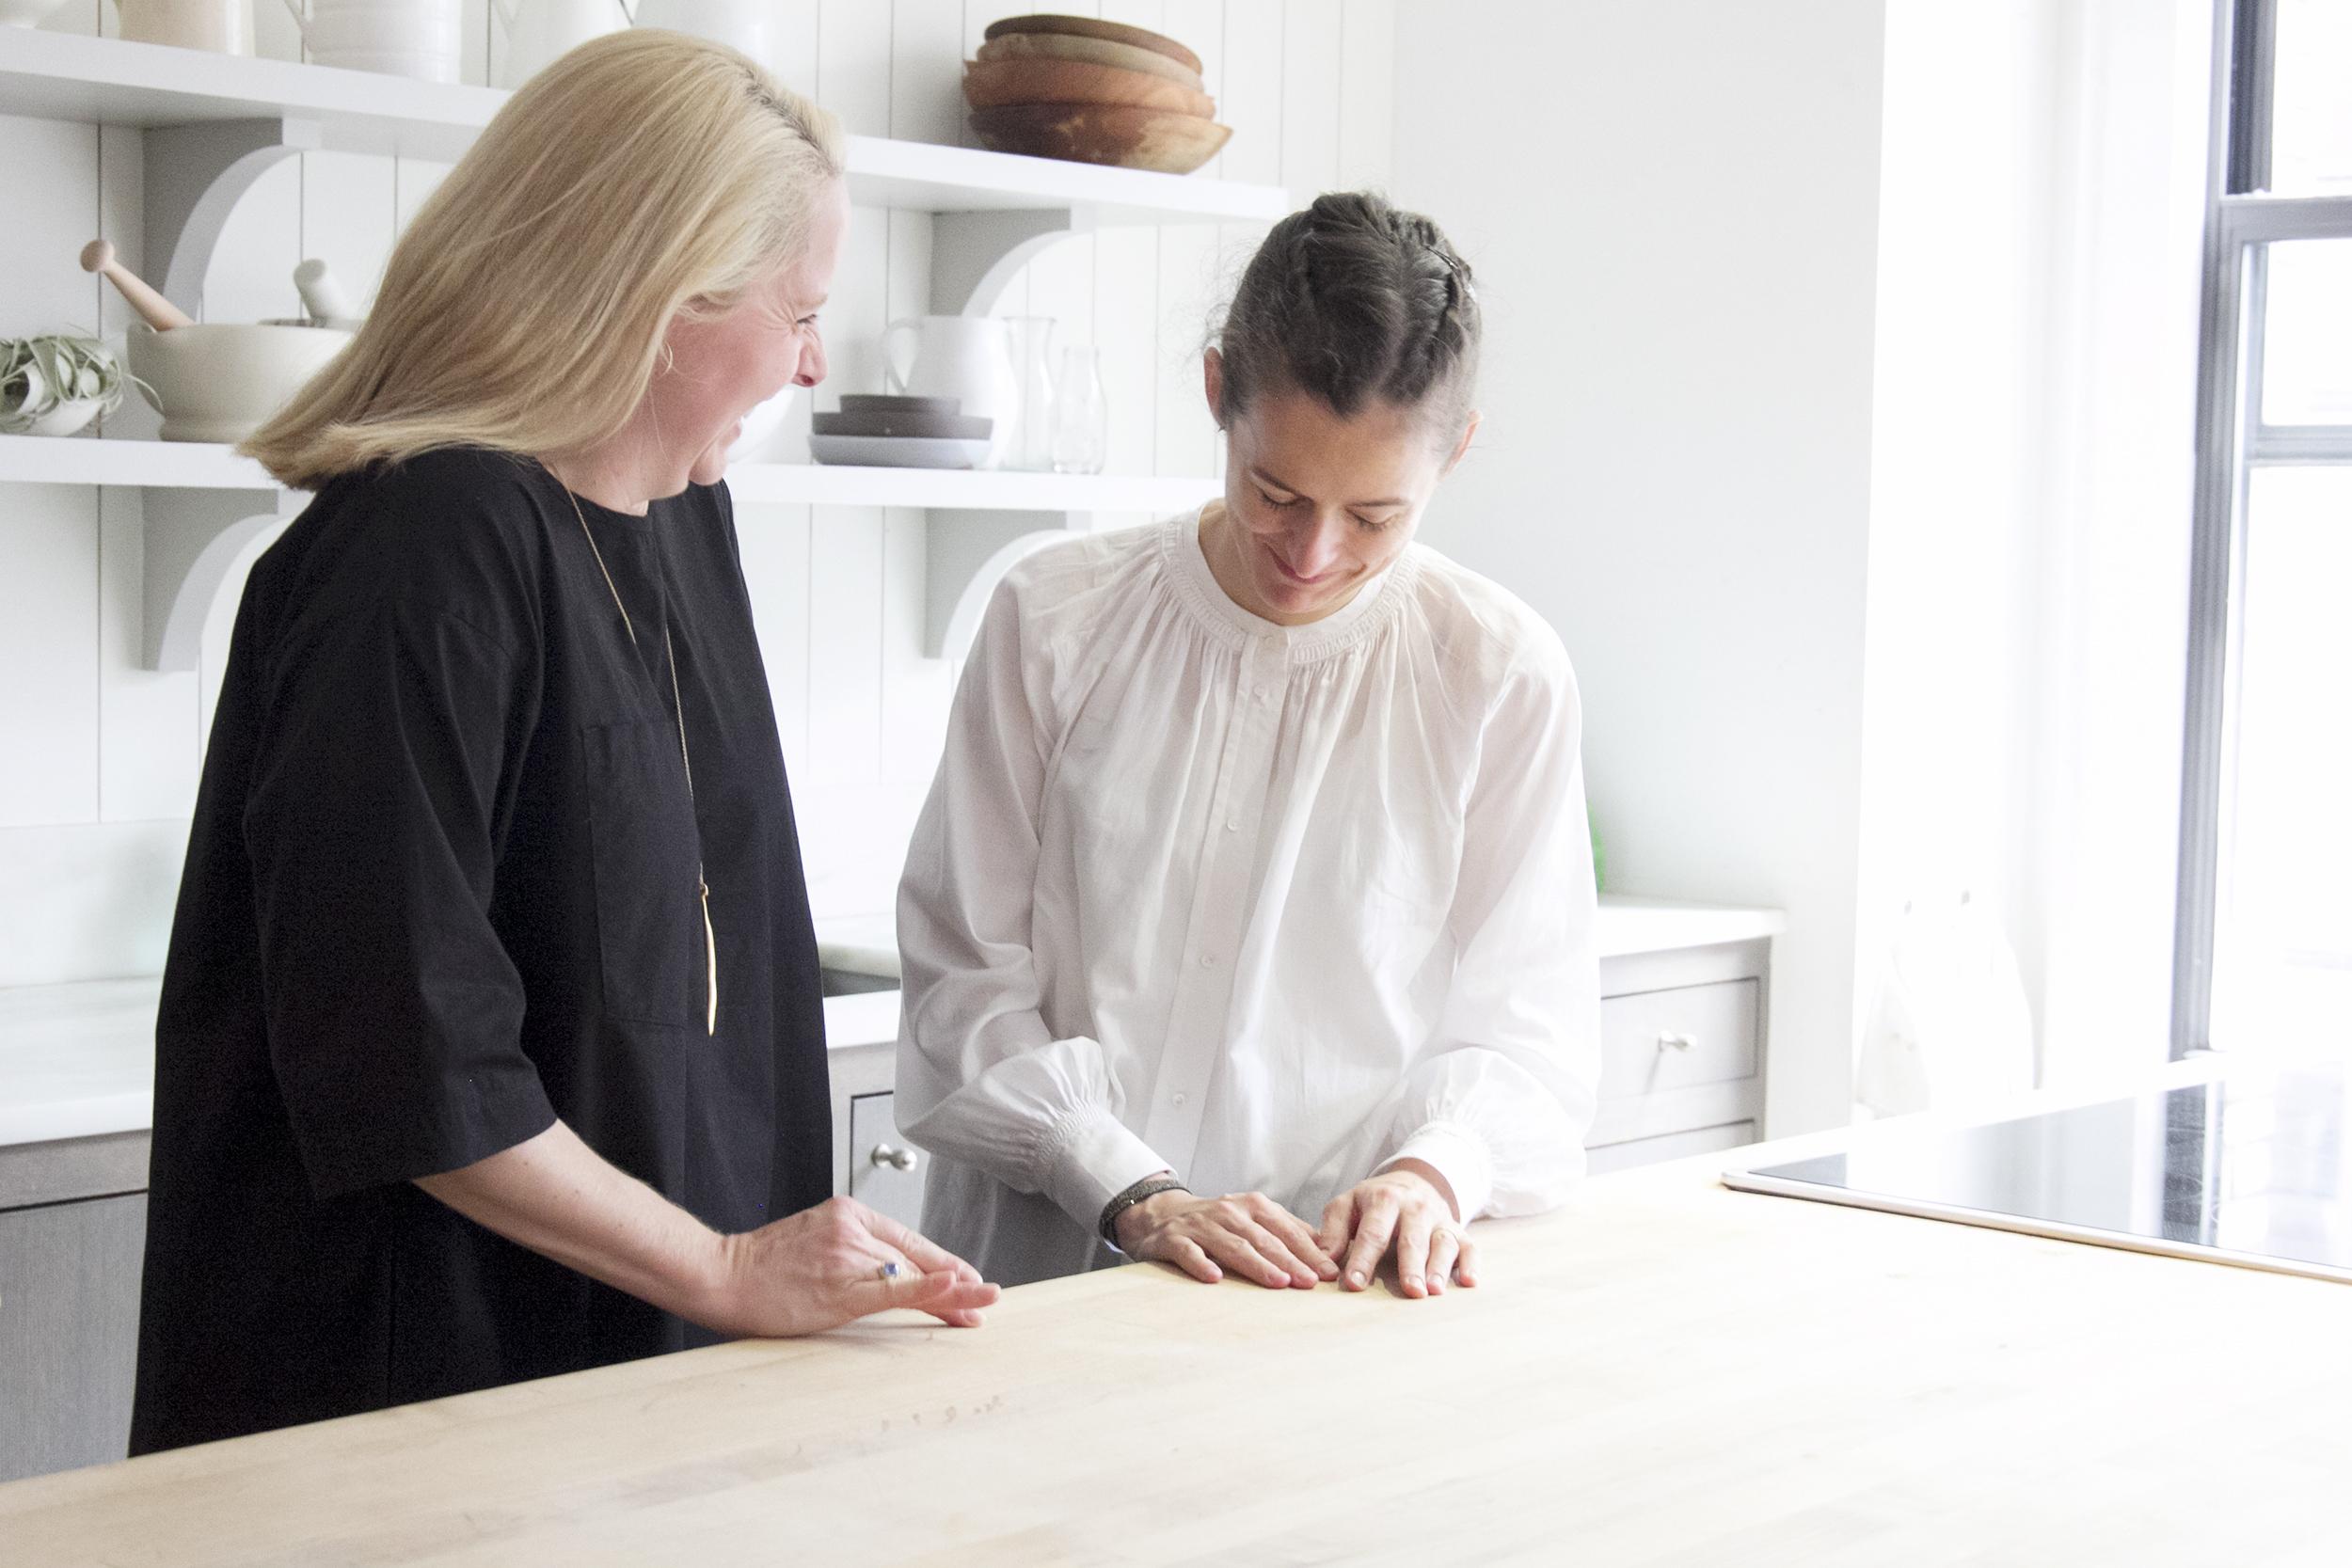 Food52 founders, Amanda Hesser and Merrill Stubbs